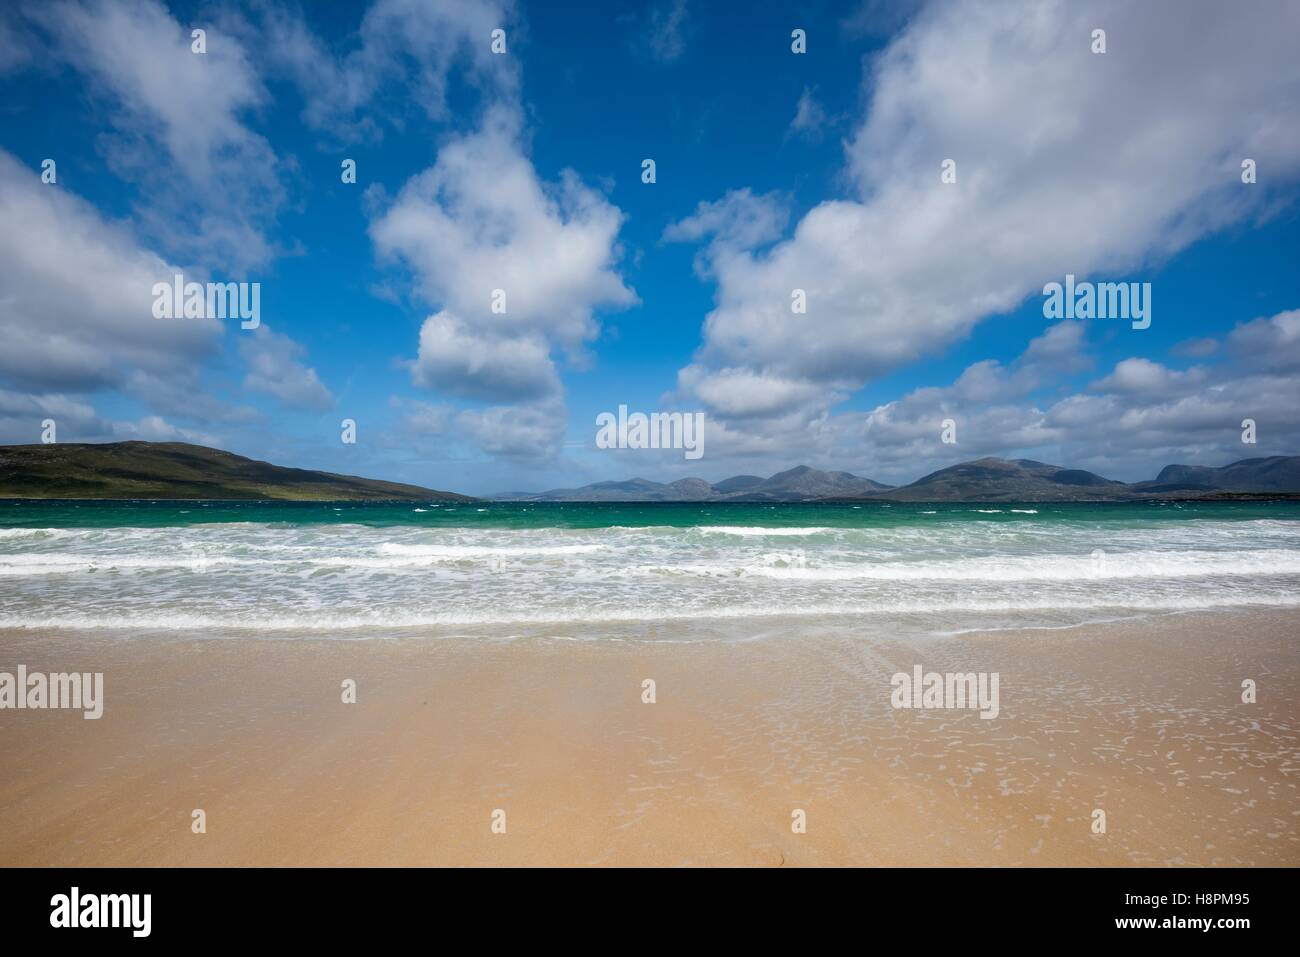 Sandy Luskentyre Beach, Isle of Harris, Outer Hebrides, Scotland, United Kingdom Stock Photo